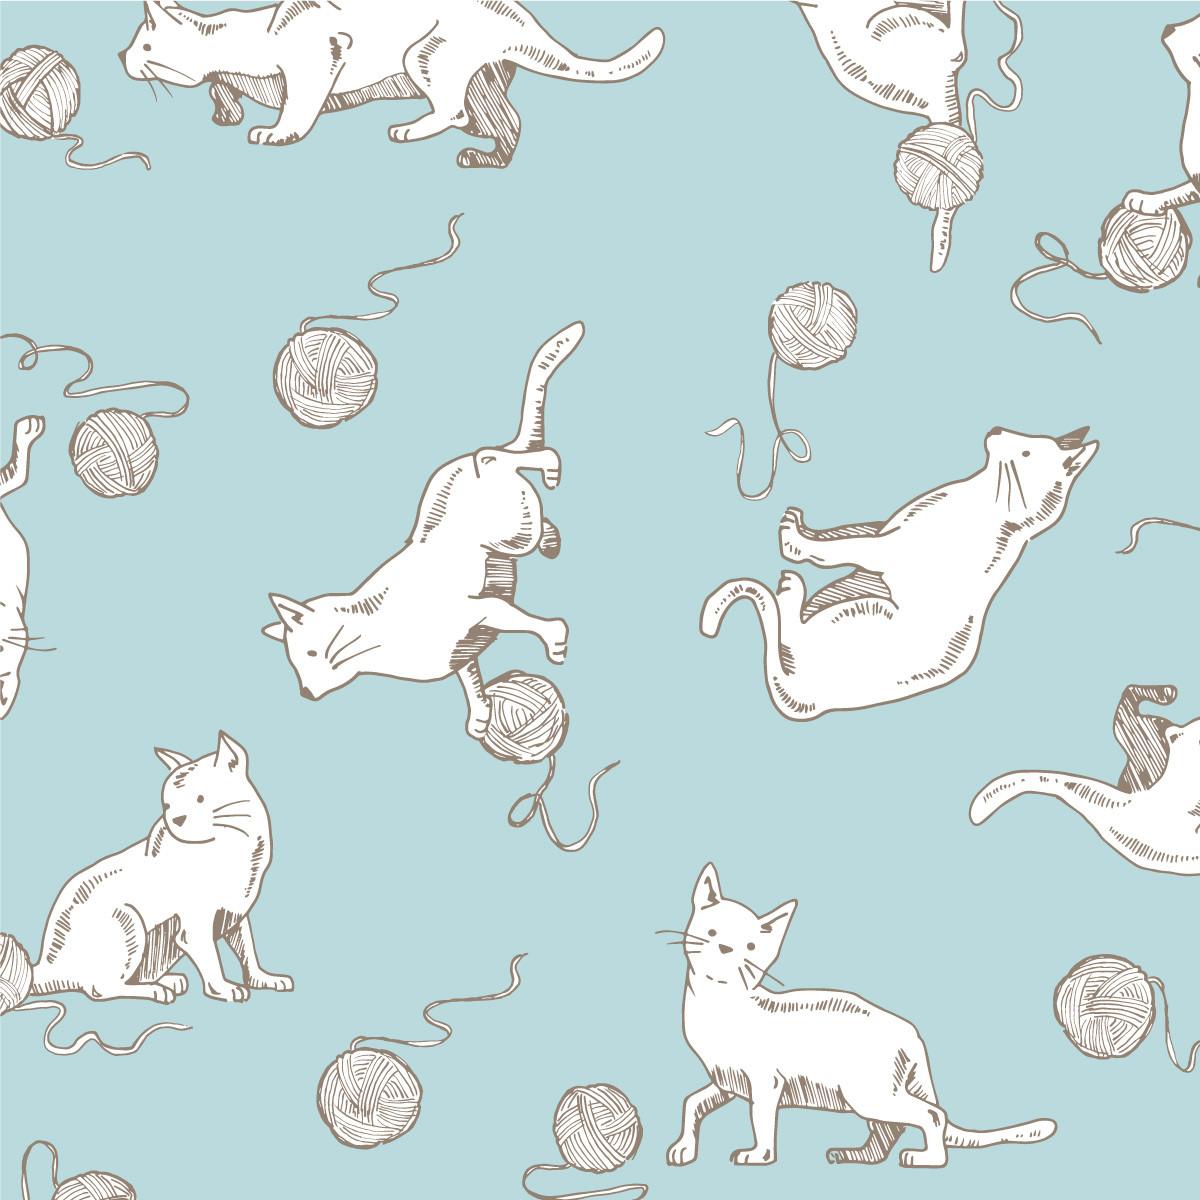 ECAMPANELLA-STUDIOS-CAT-BED-PRINT.jpg